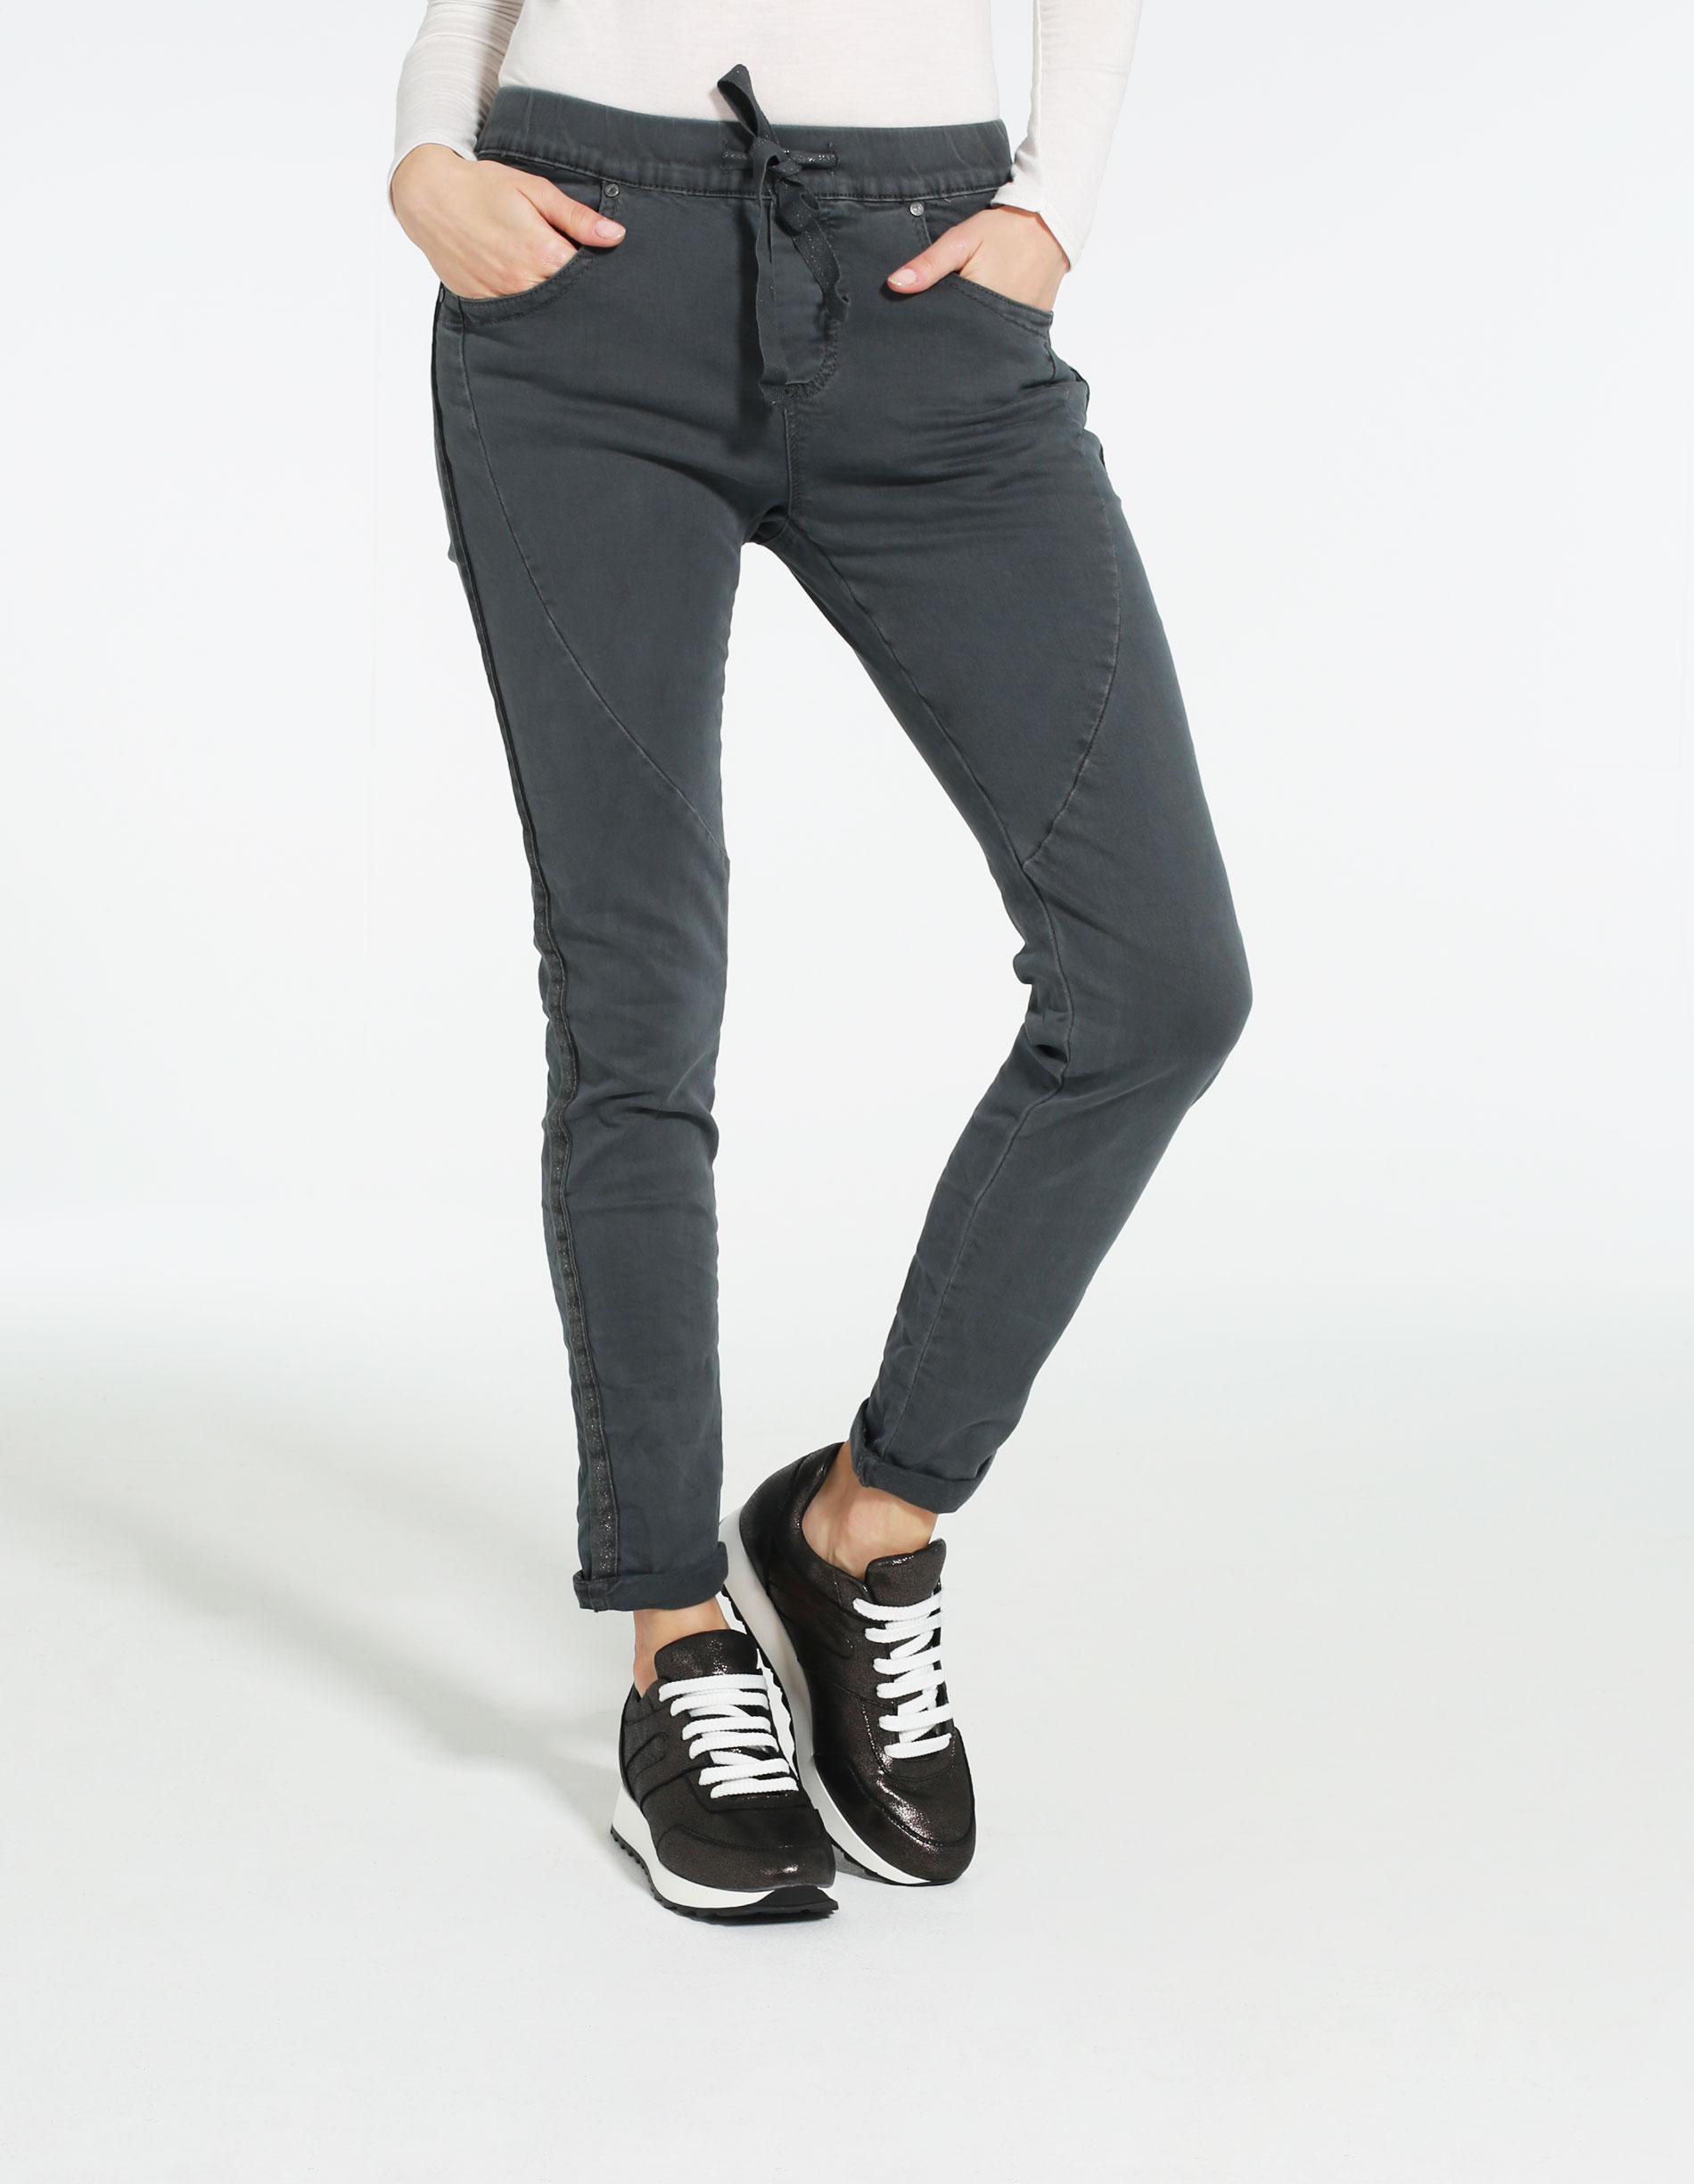 Spodnie - 42-6568 GRIGI - Unisono